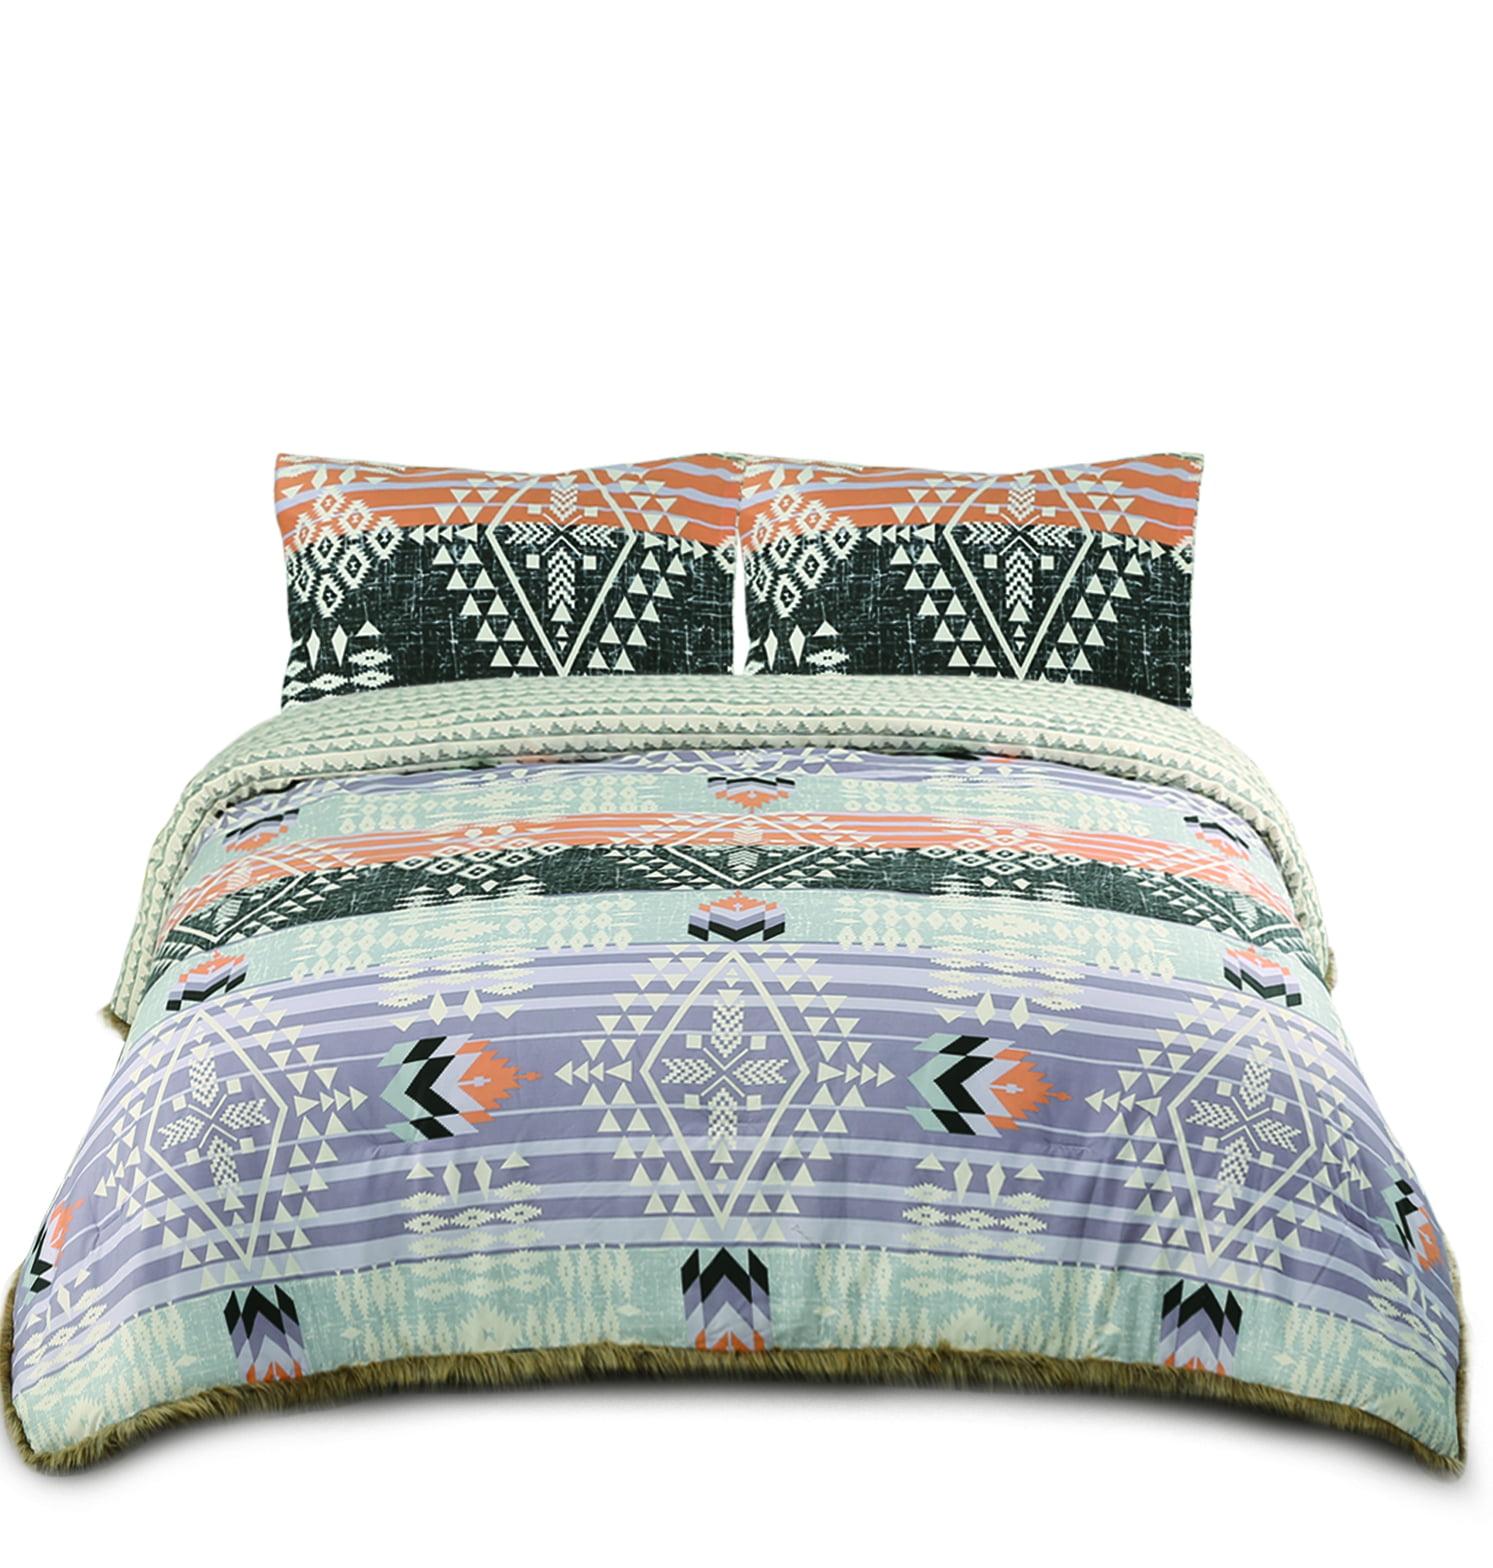 Muk Luks Bohemian Style Comforter Set With Fur Trim 2 Matching Shams Full Queen Size Peach Purple Walmart Com Walmart Com